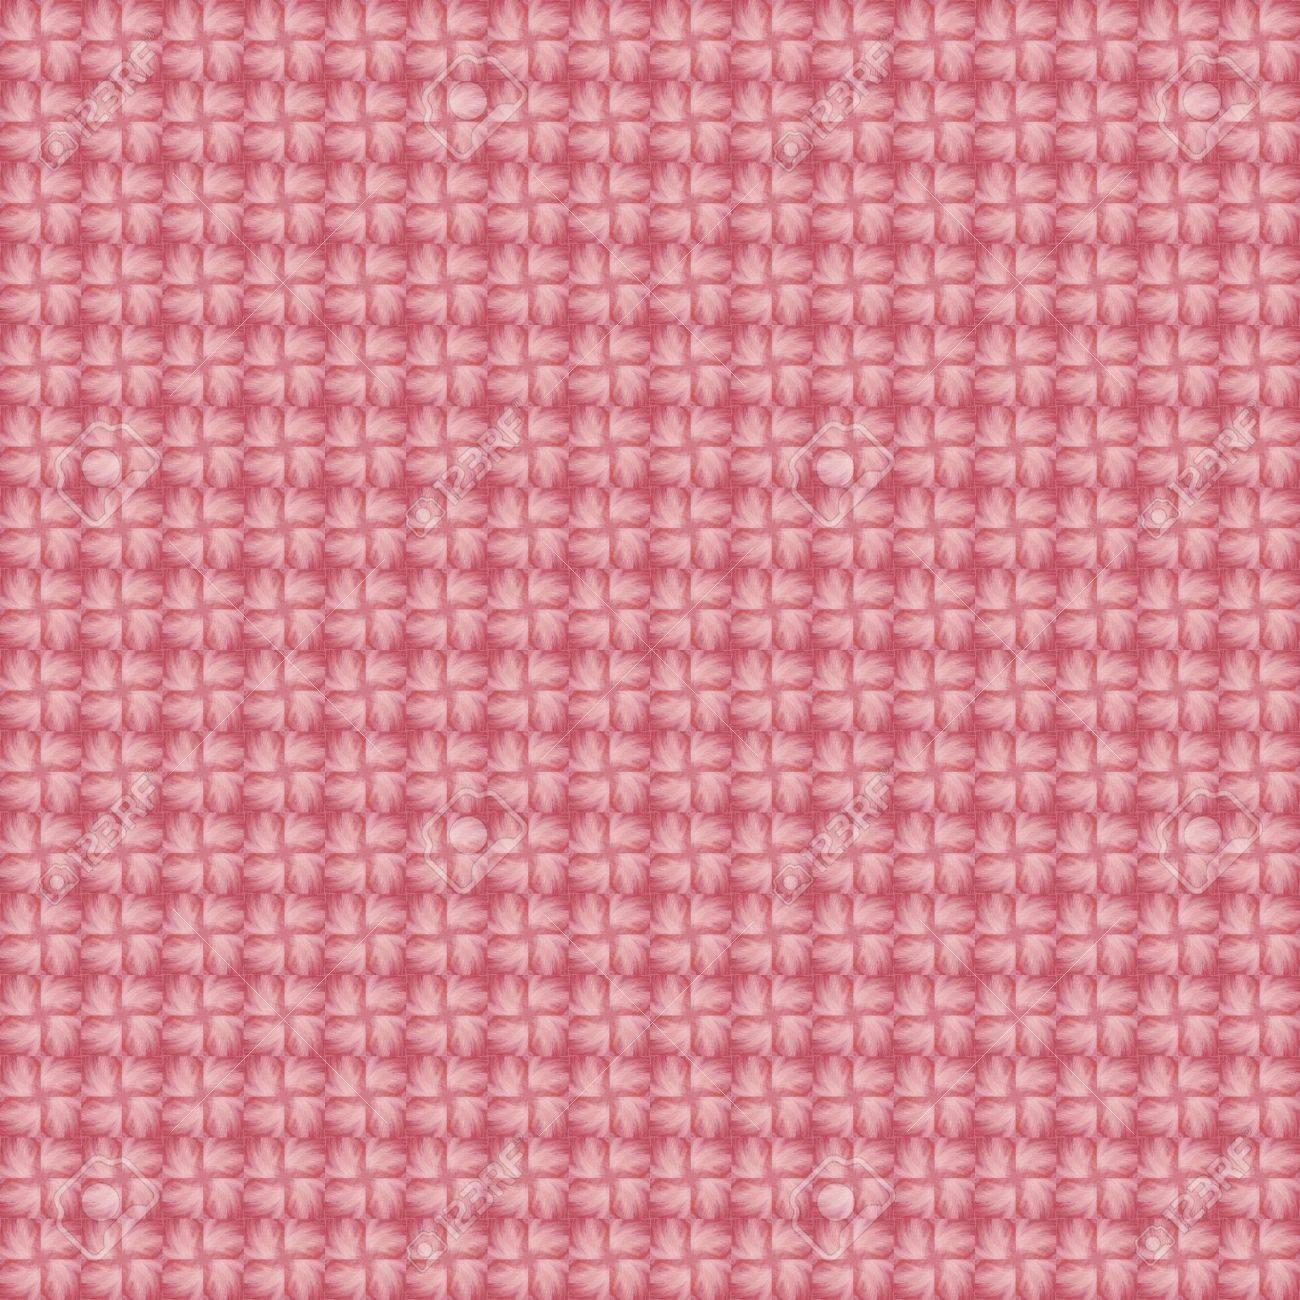 Furry Pink Background stock photo 173021072 | iStock